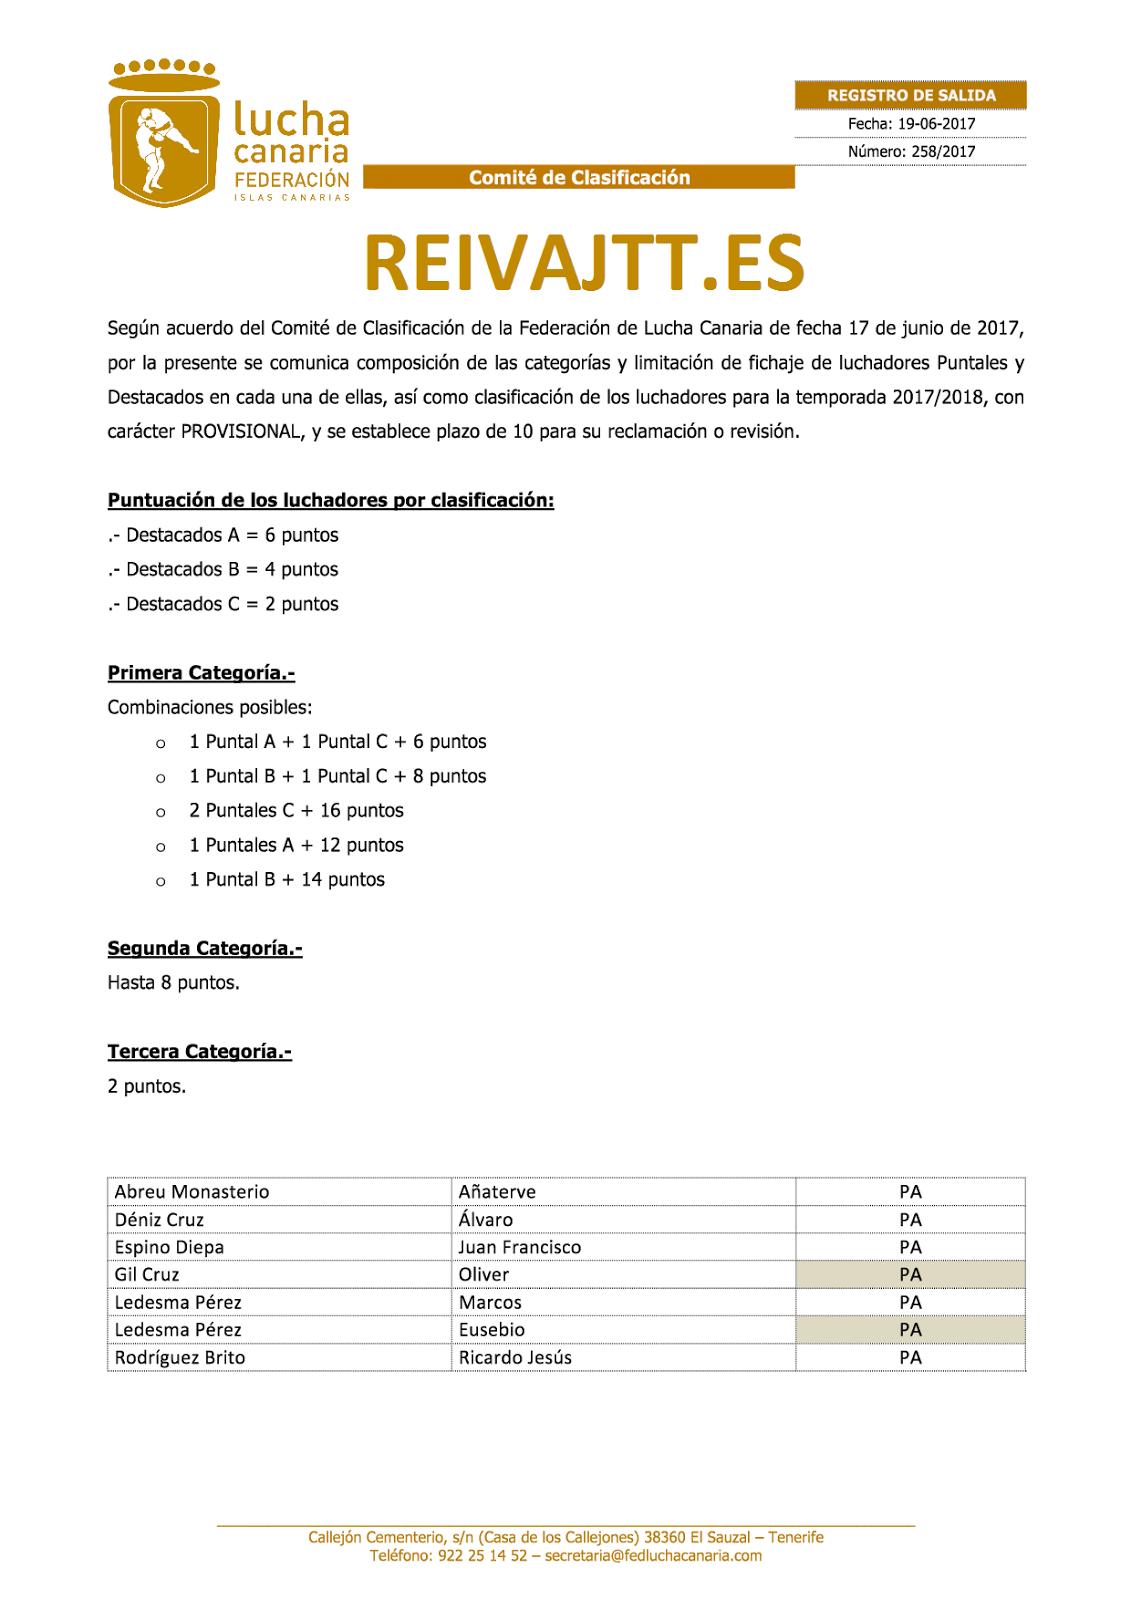 Reivajtt.es